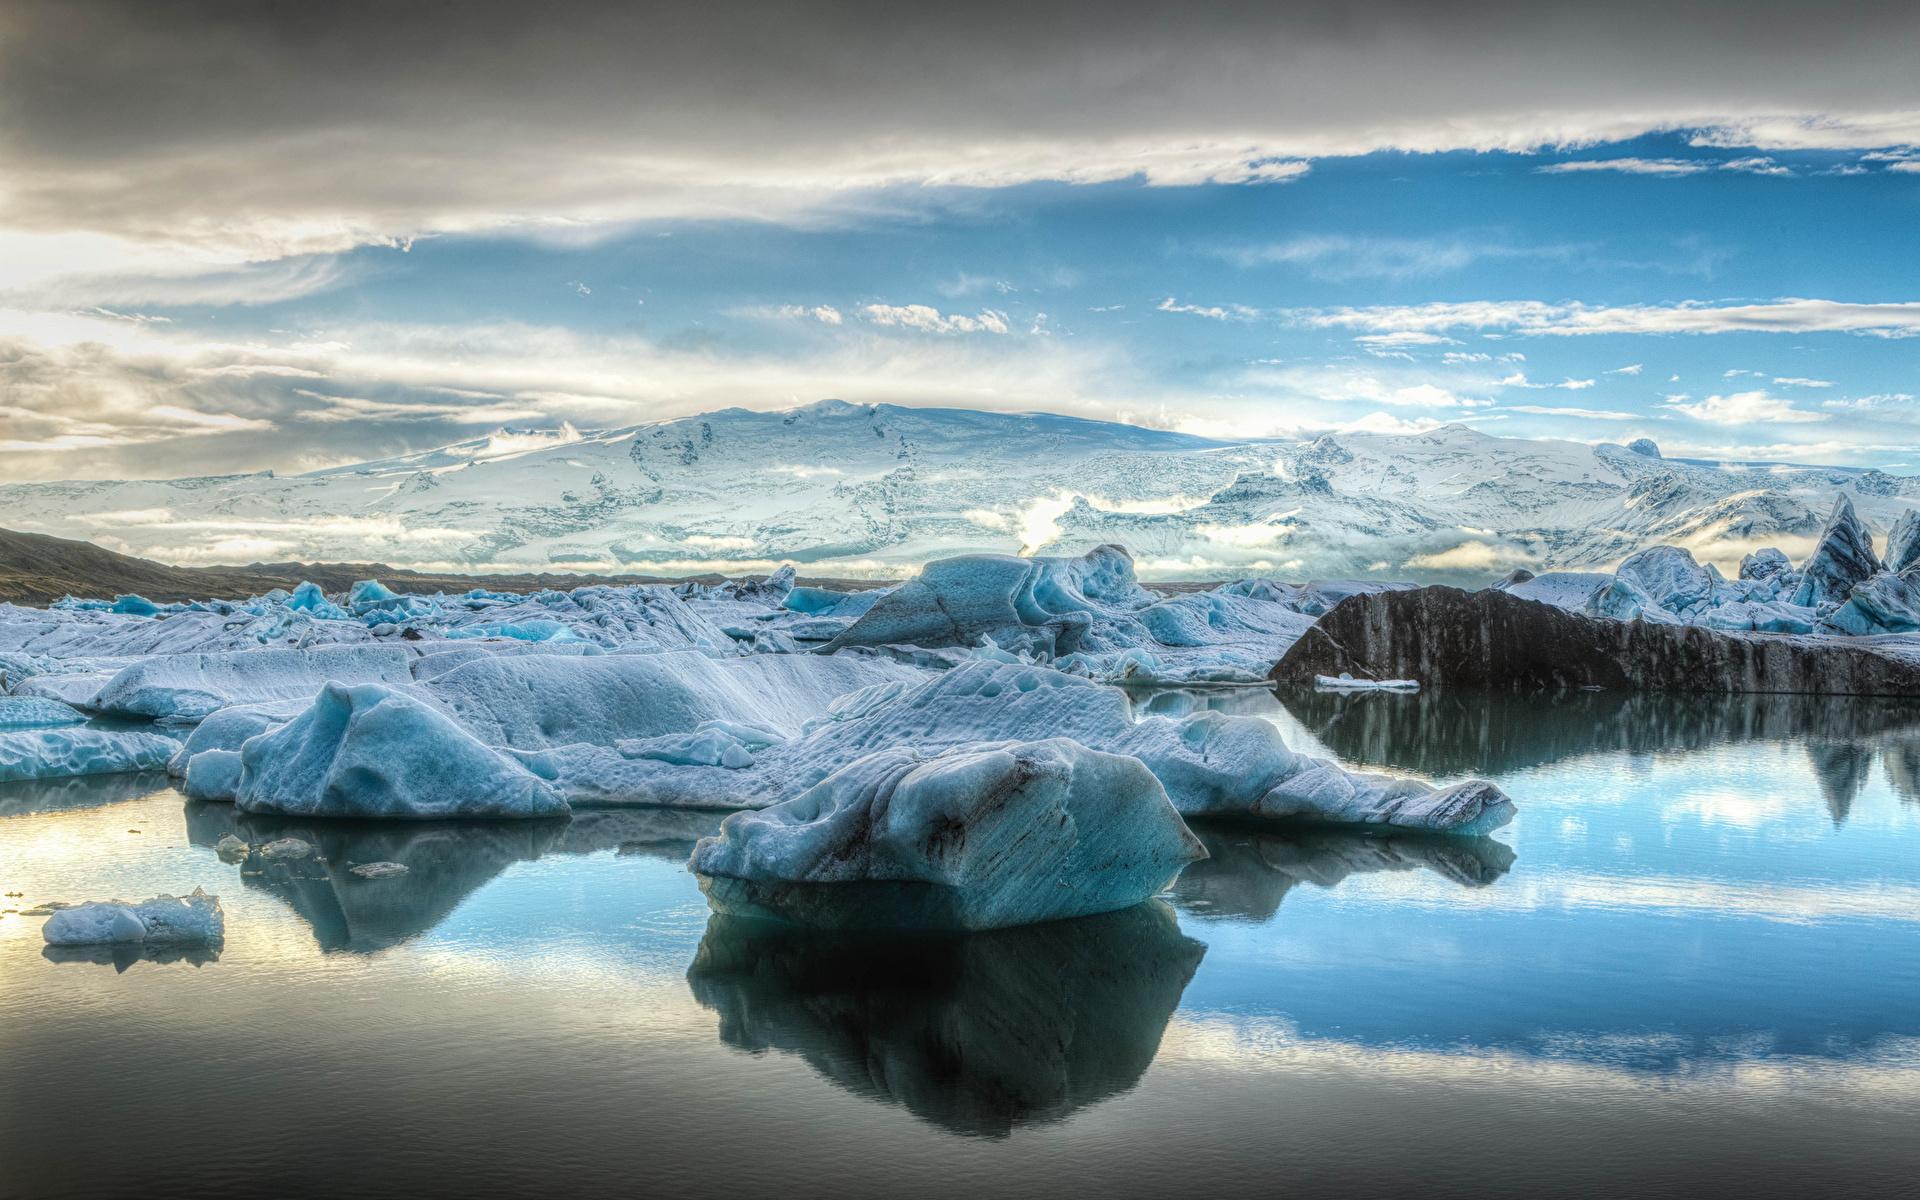 ледник природа облака горы снег лед бесплатно